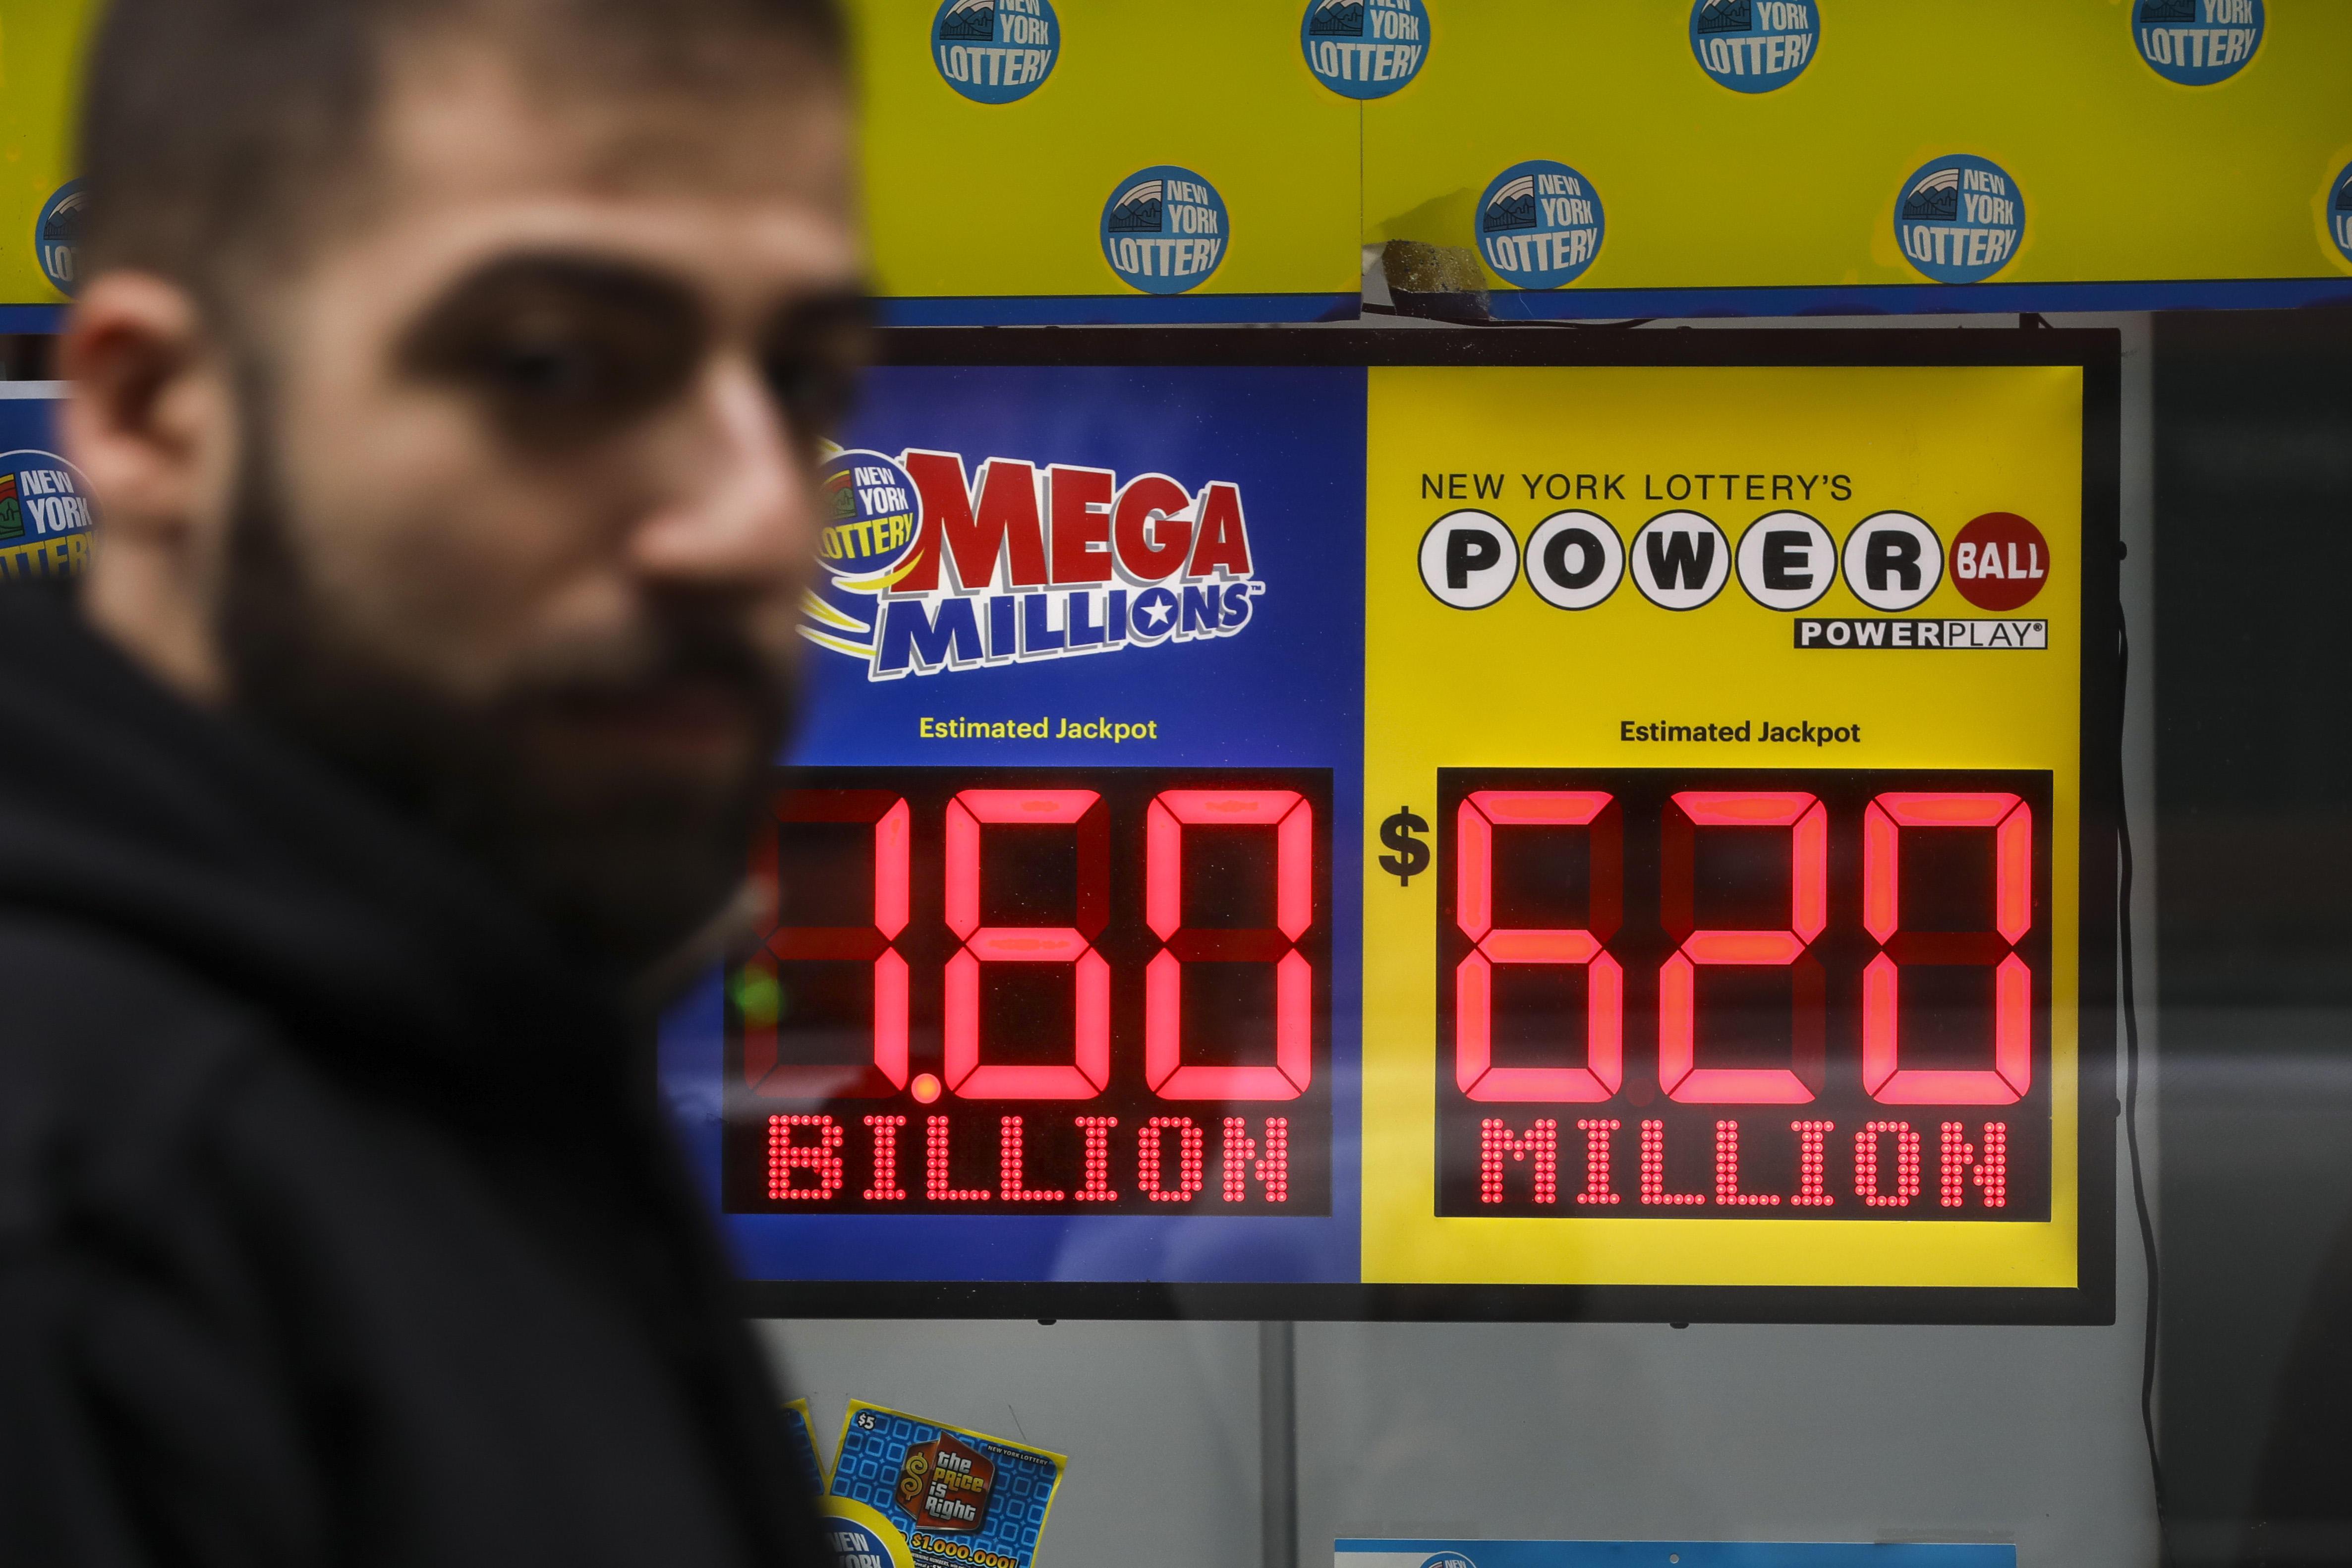 Mega Millions Winning Numbers Tonight 5 28 62 65 70 And Mega Ball 5 For 1 6 Billion Lottery Jackpot Cbs News